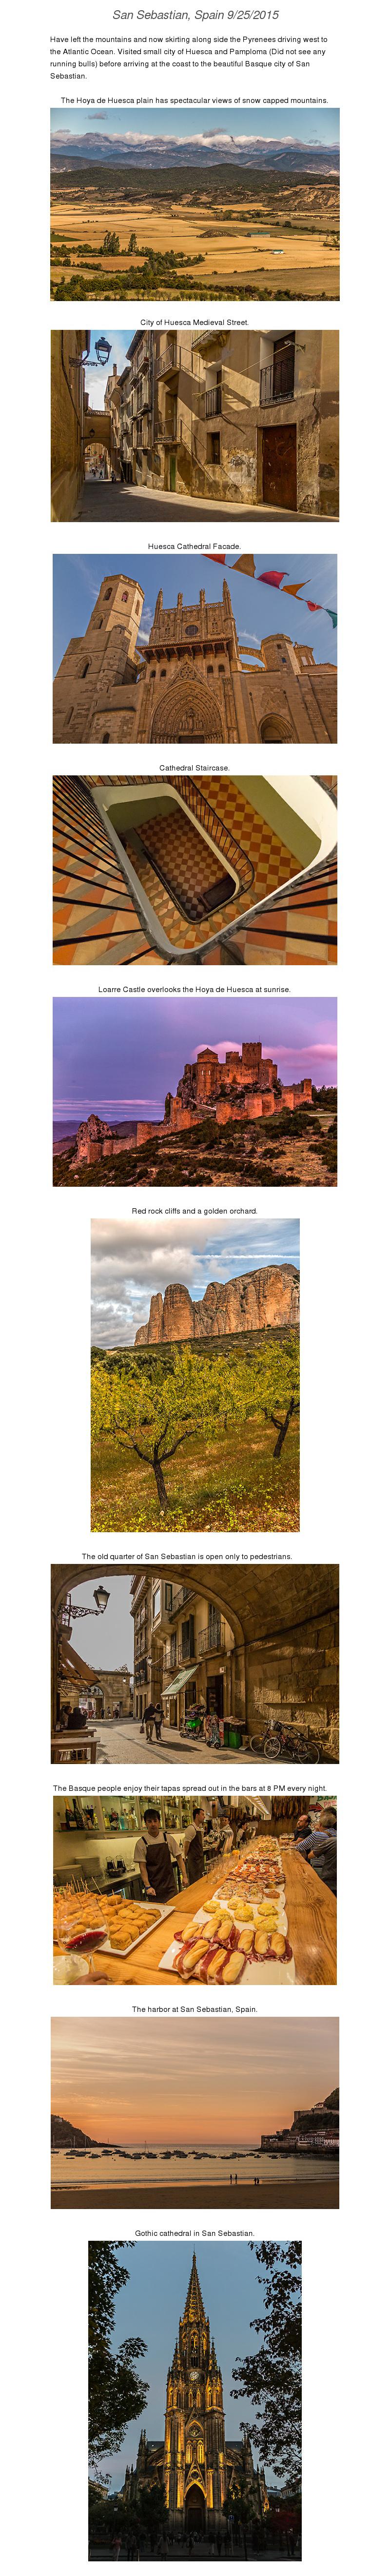 Spain Blog 6